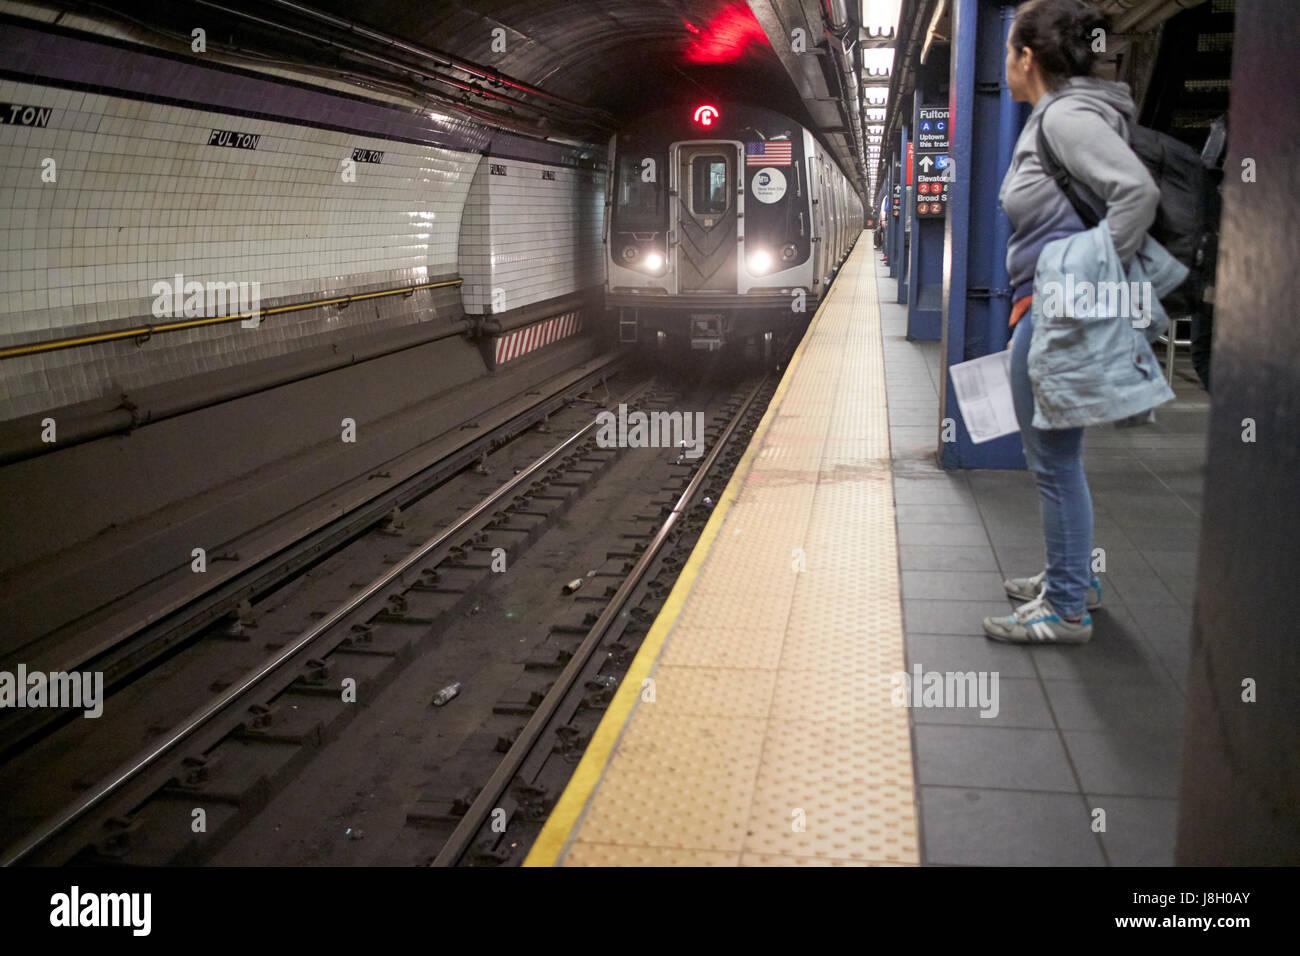 New York City subway train approaching platform fulton station manhattan USA - Stock Image